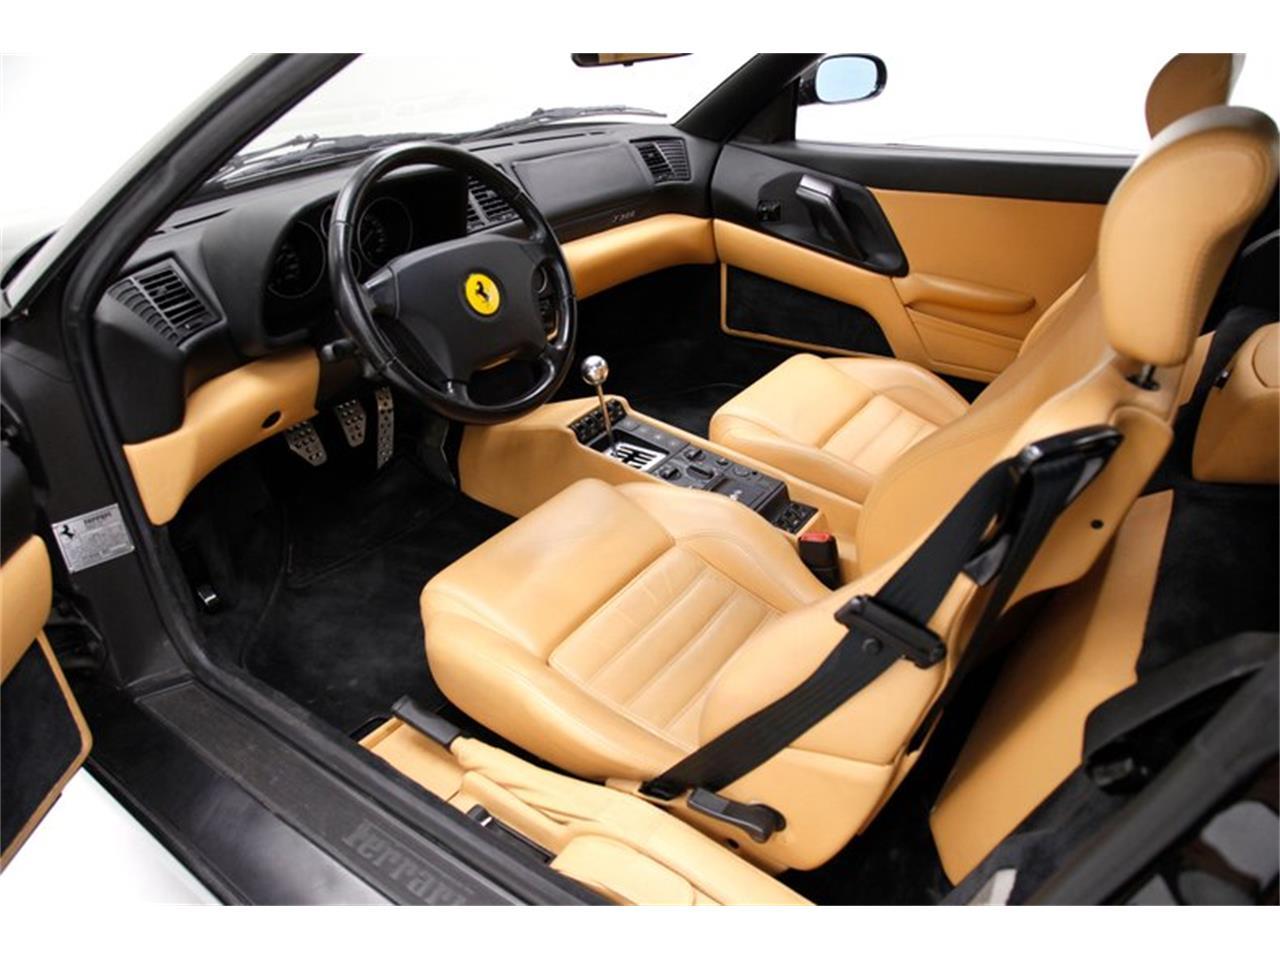 1998 Ferrari F355 (CC-1416025) for sale in Morgantown, Pennsylvania